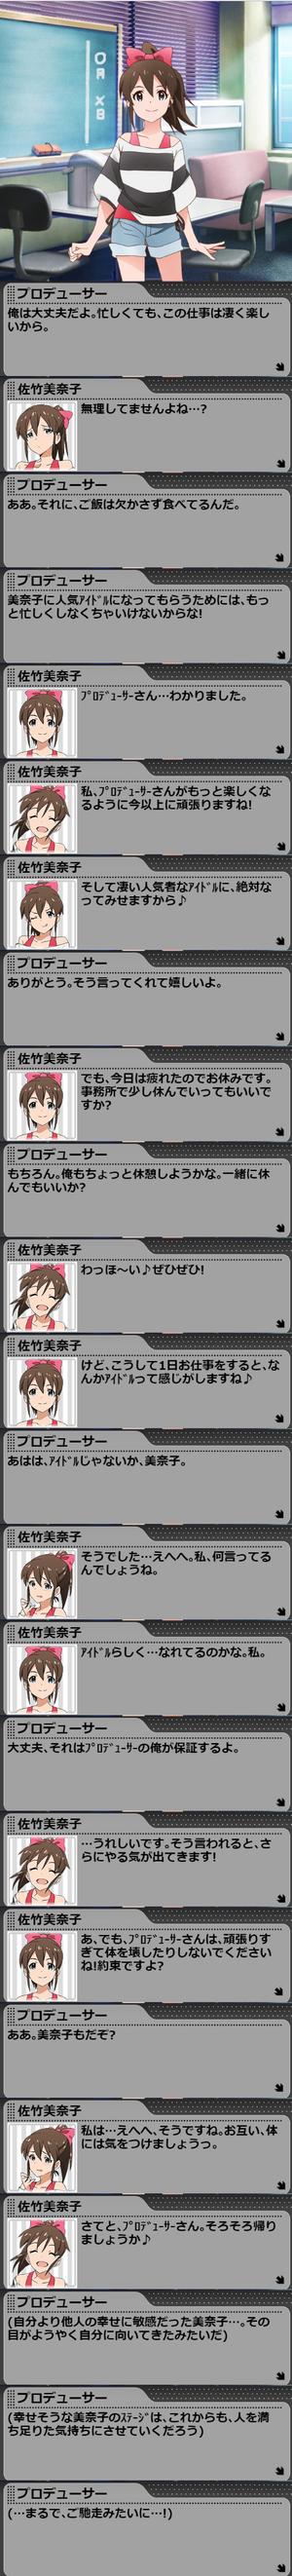 美奈子LV6_4